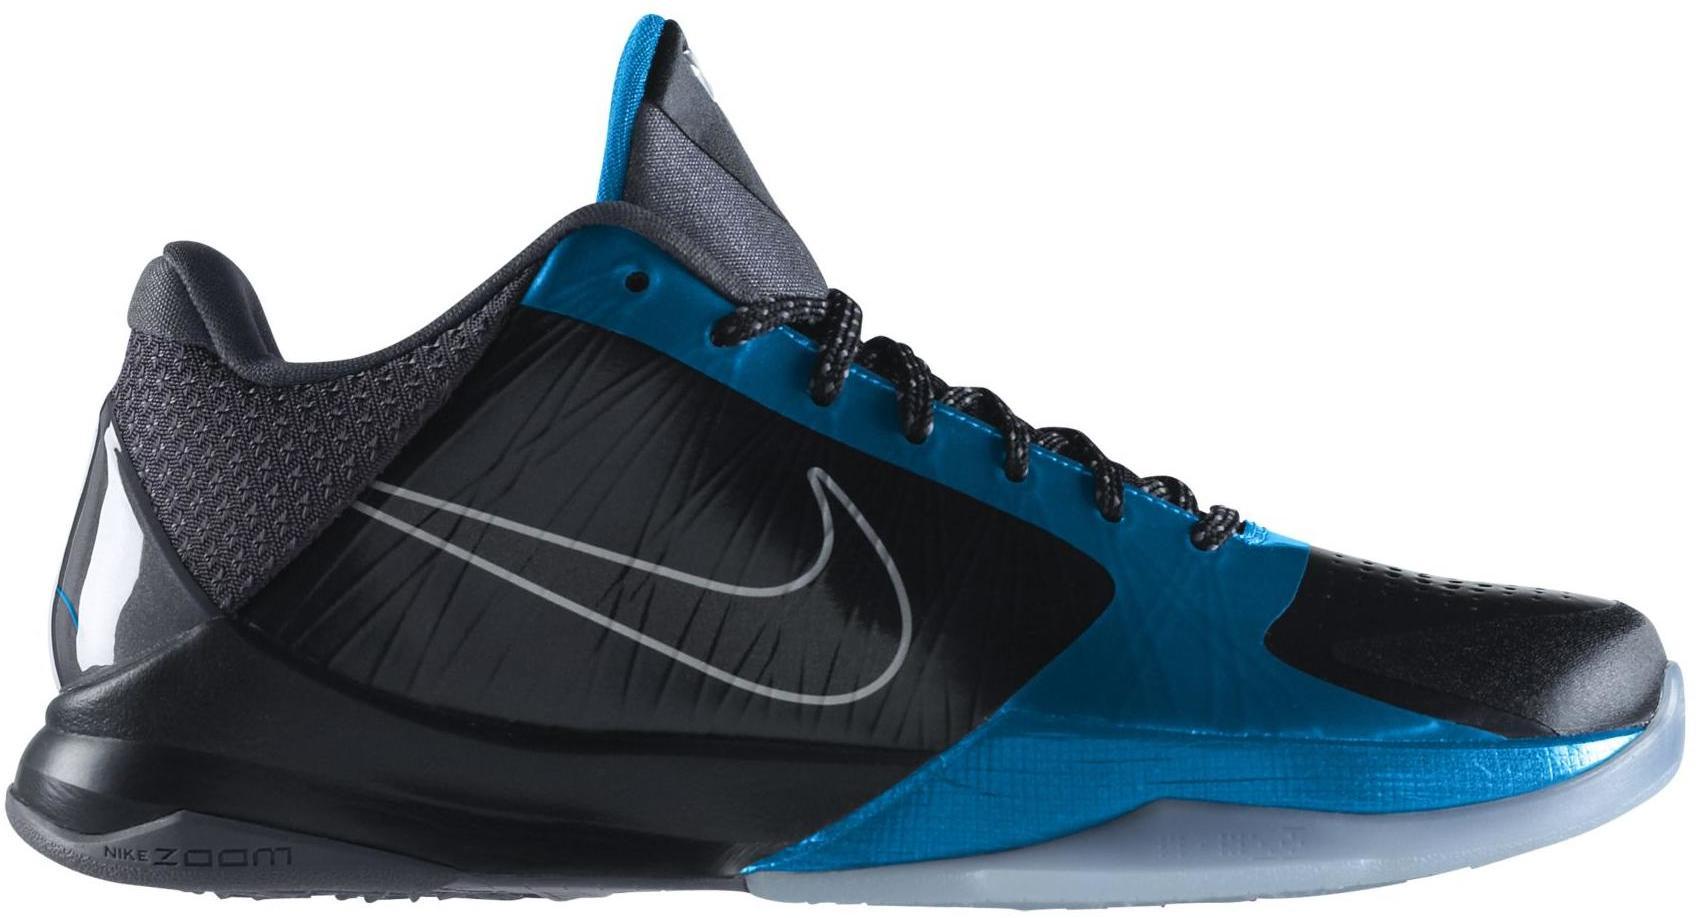 Nike Kobe 5 Dark Knight Sneakers (Black/Black-Dark Grey-Neptune Blue)